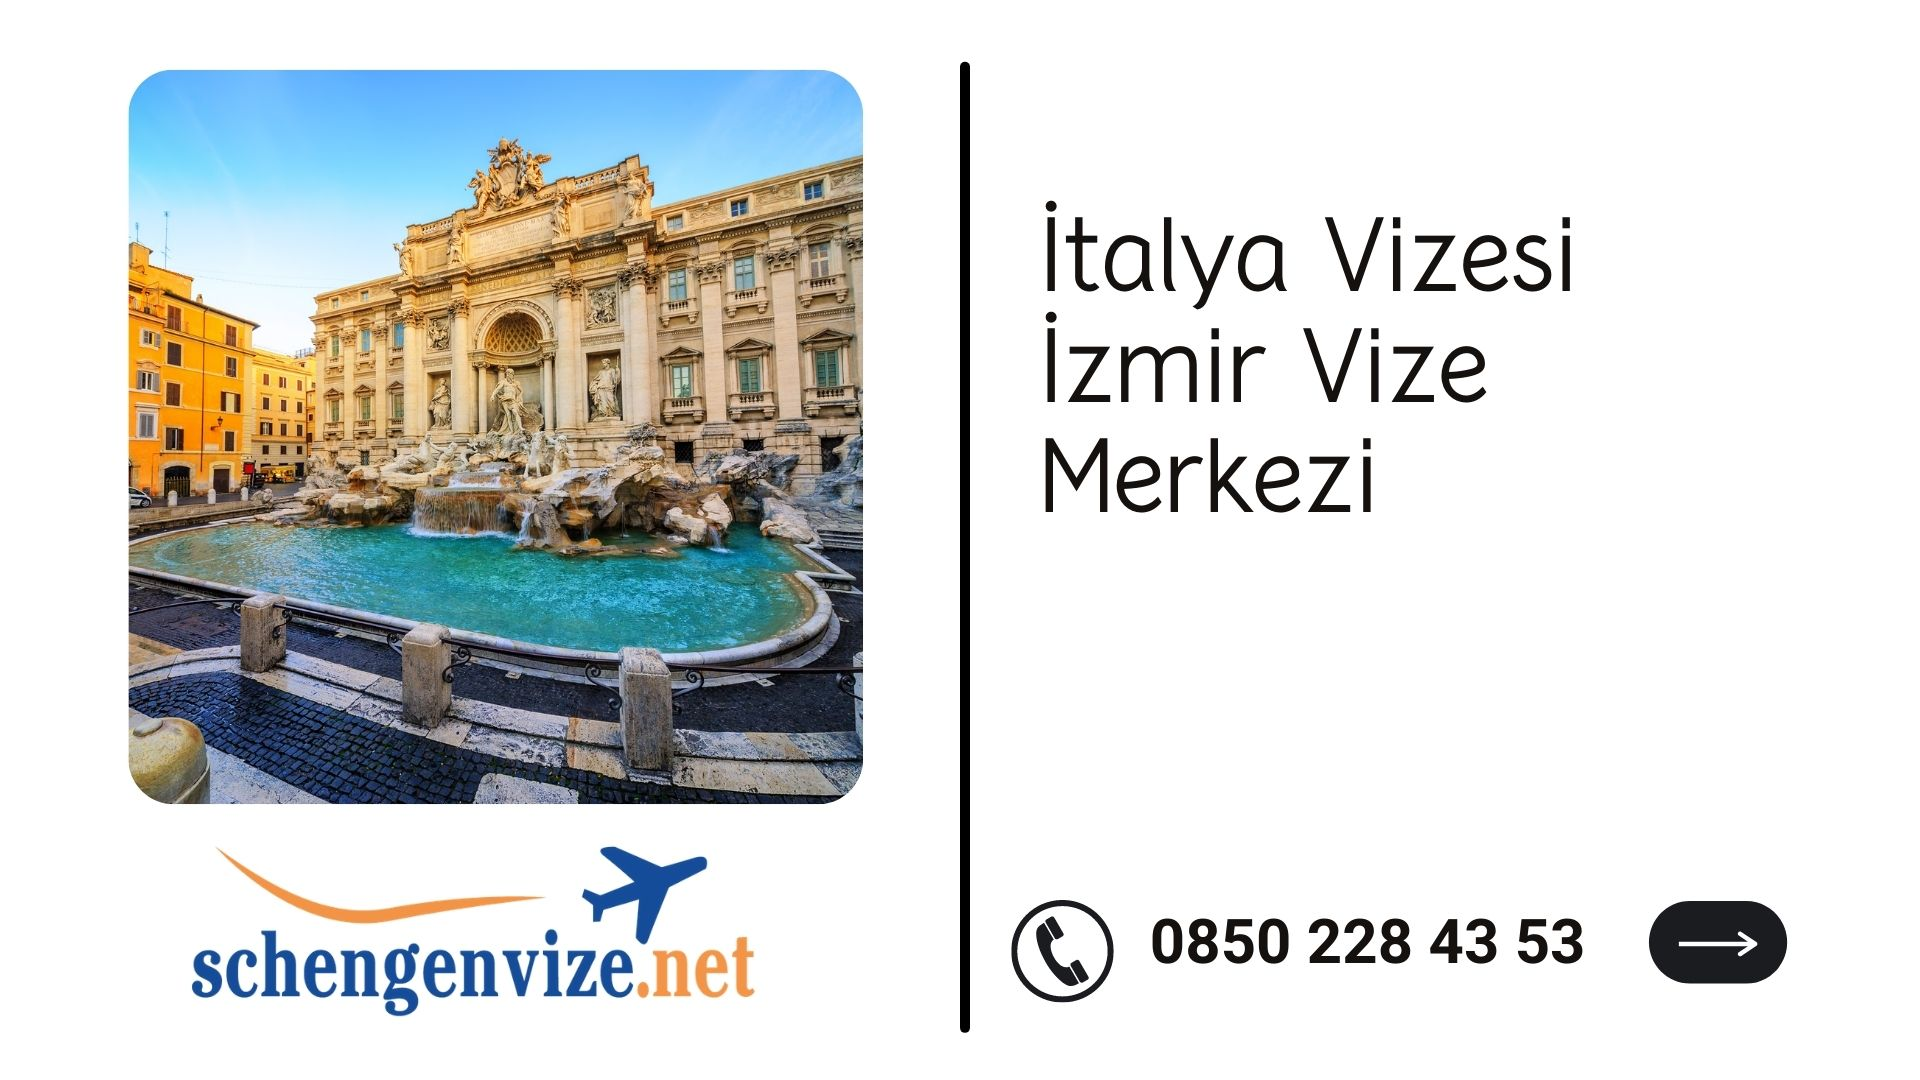 İtalya Vizesi İzmir Vize Merkezi